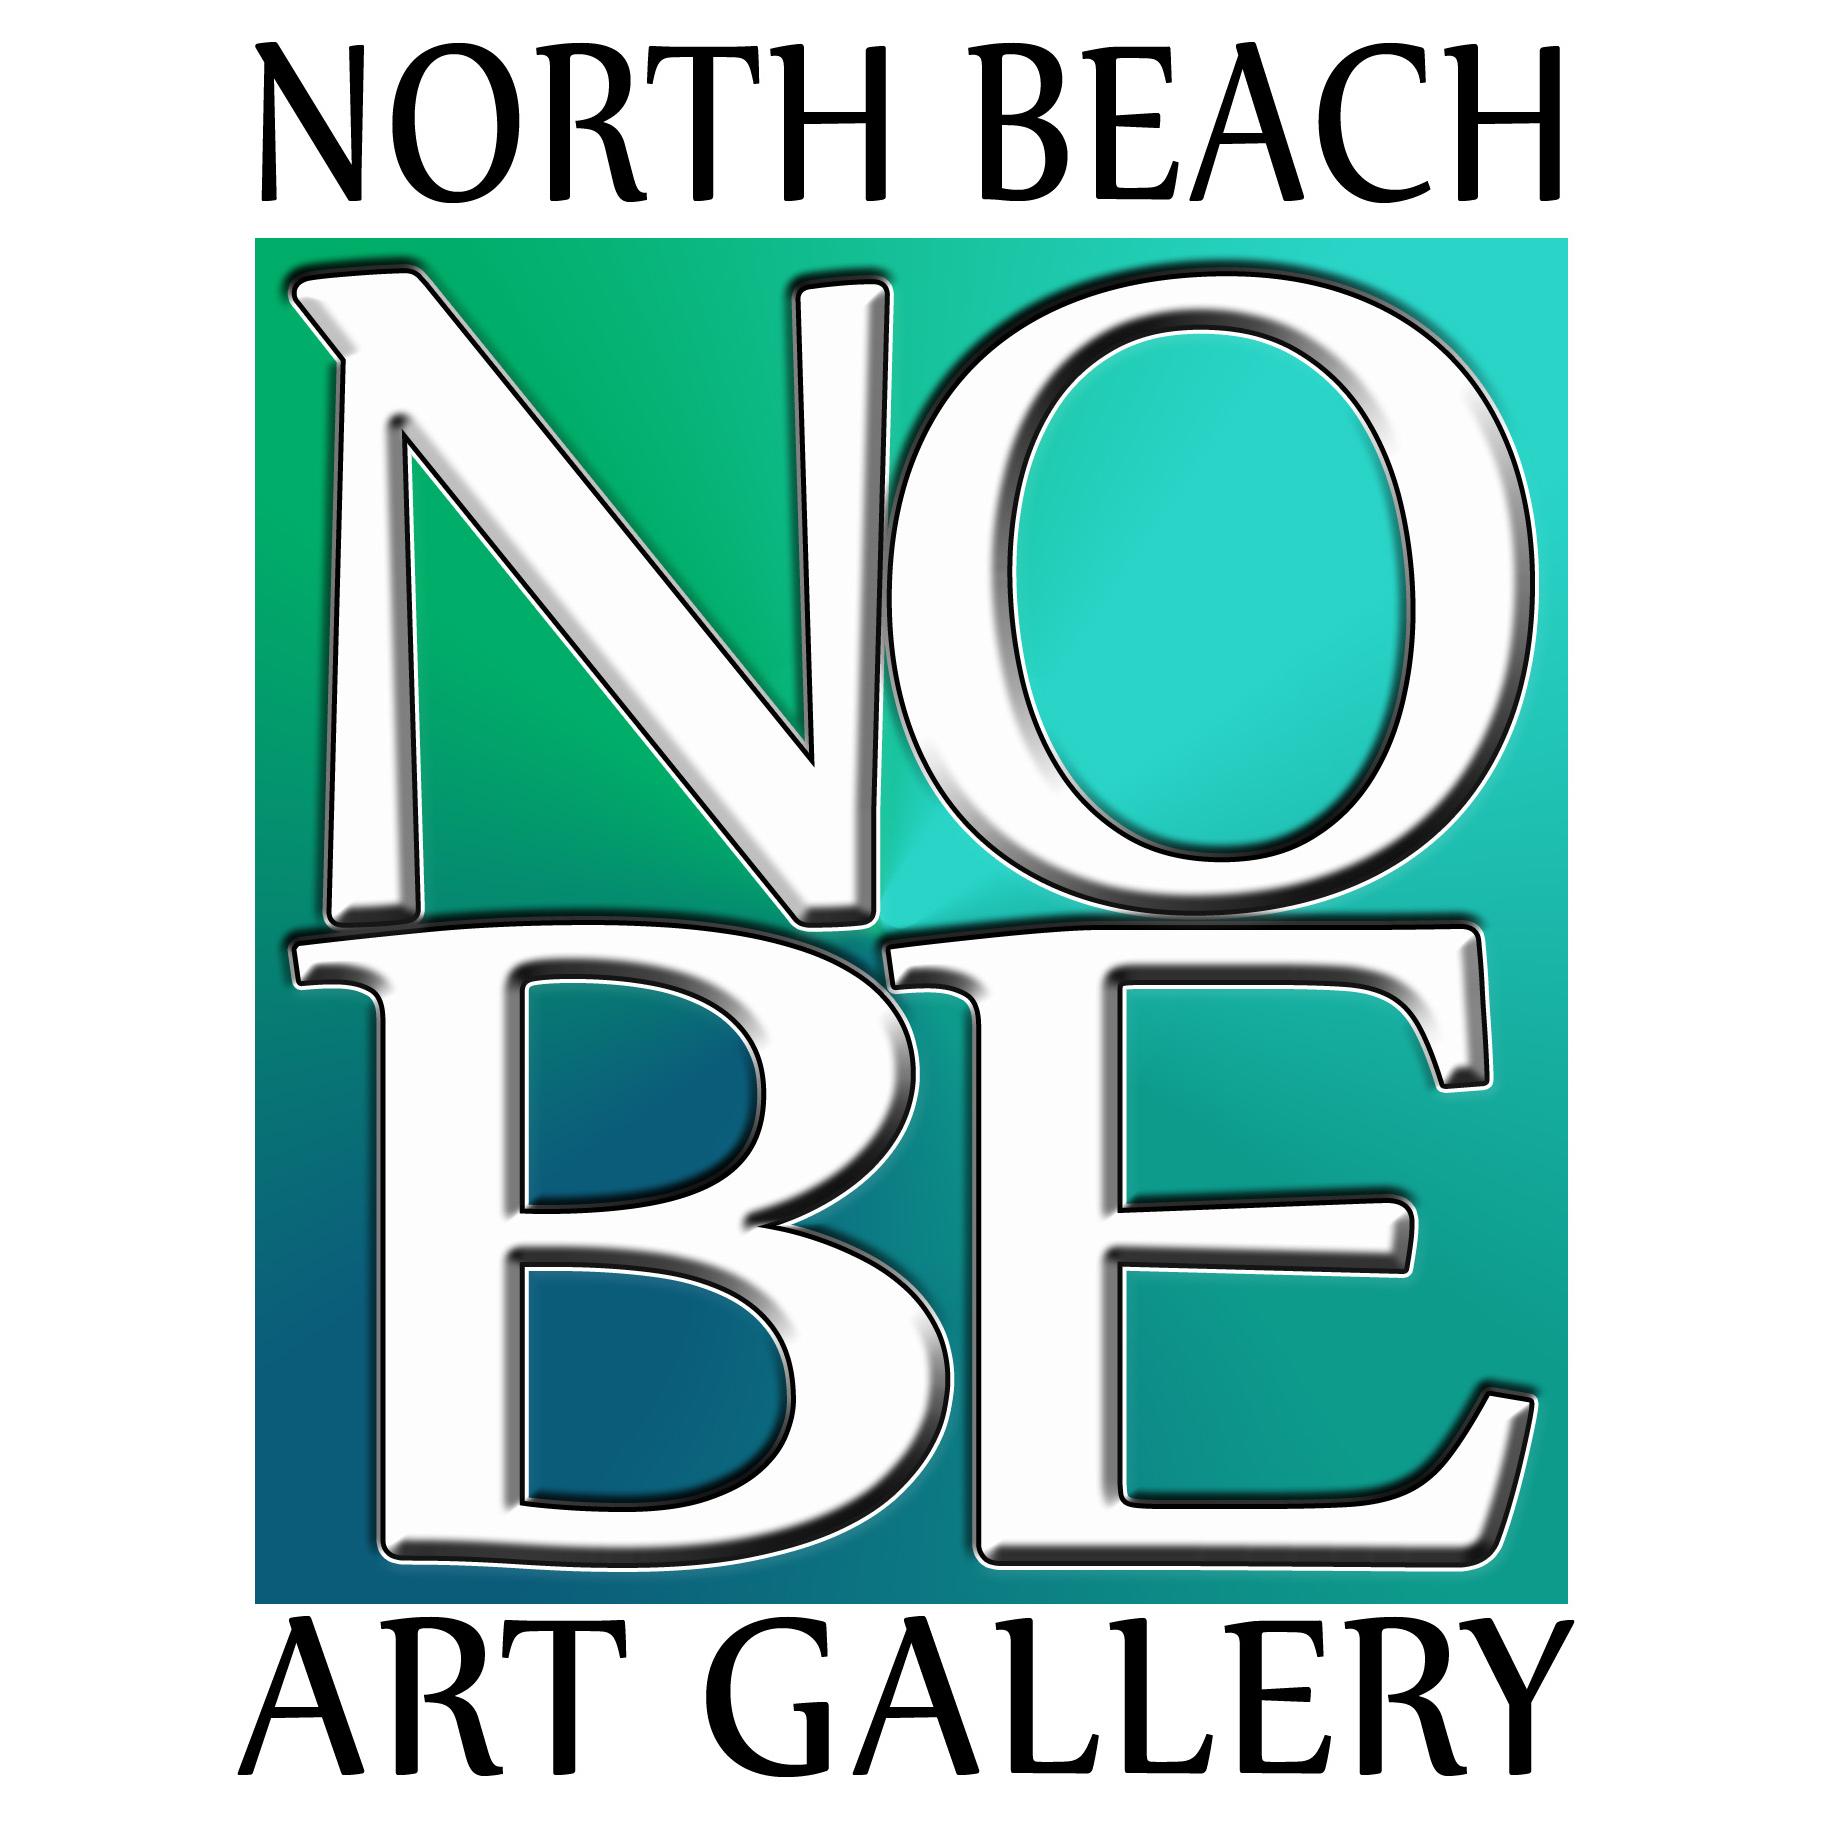 North Beach Art Gallery image 11